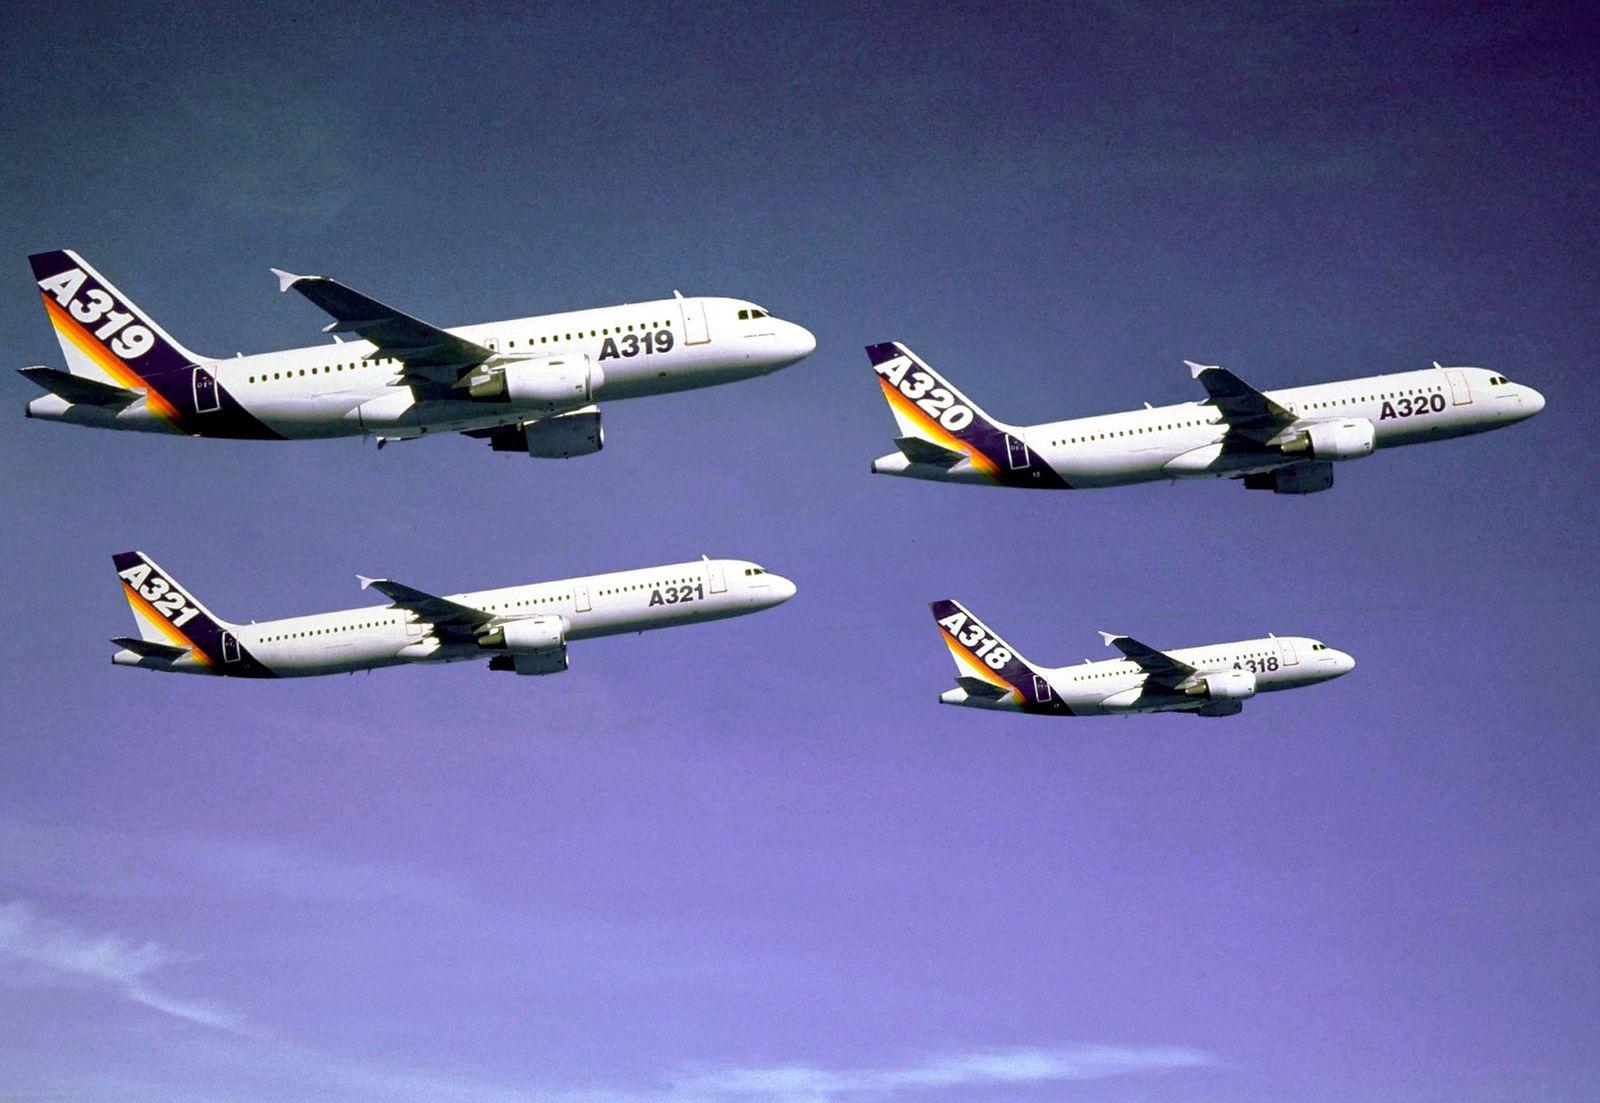 40 Jahre Airbus / Flugzeuge / A320